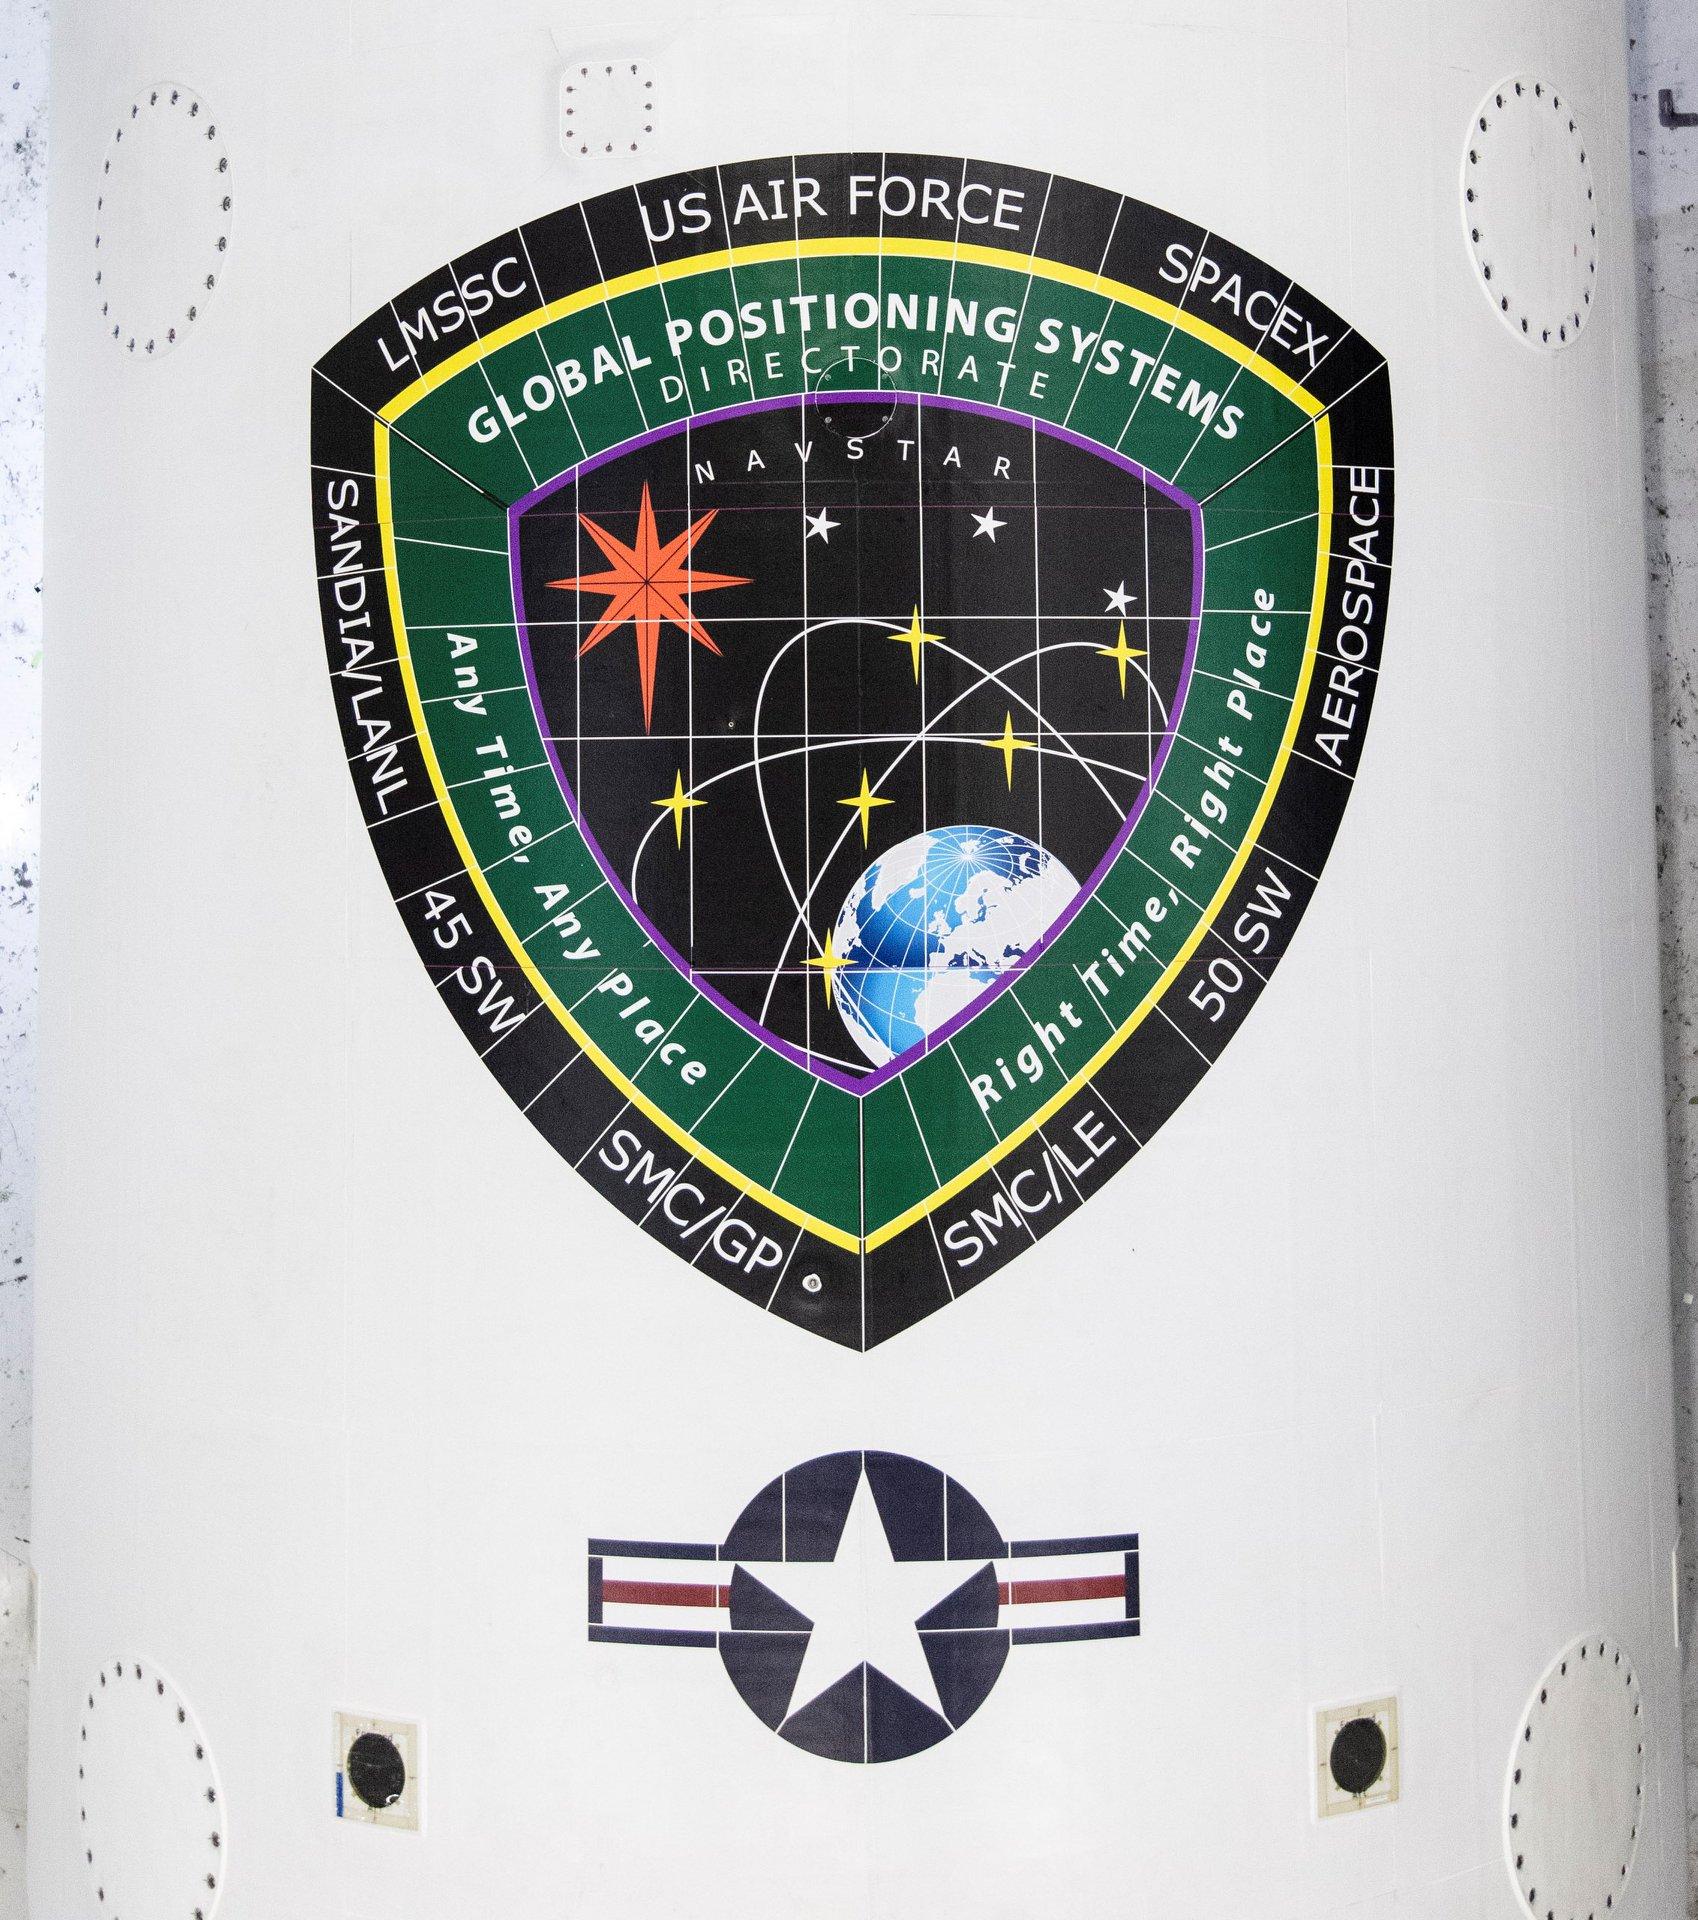 GPS III SV03 Falcon 9 B1060 processing 2019 (SpaceX) fairing 1